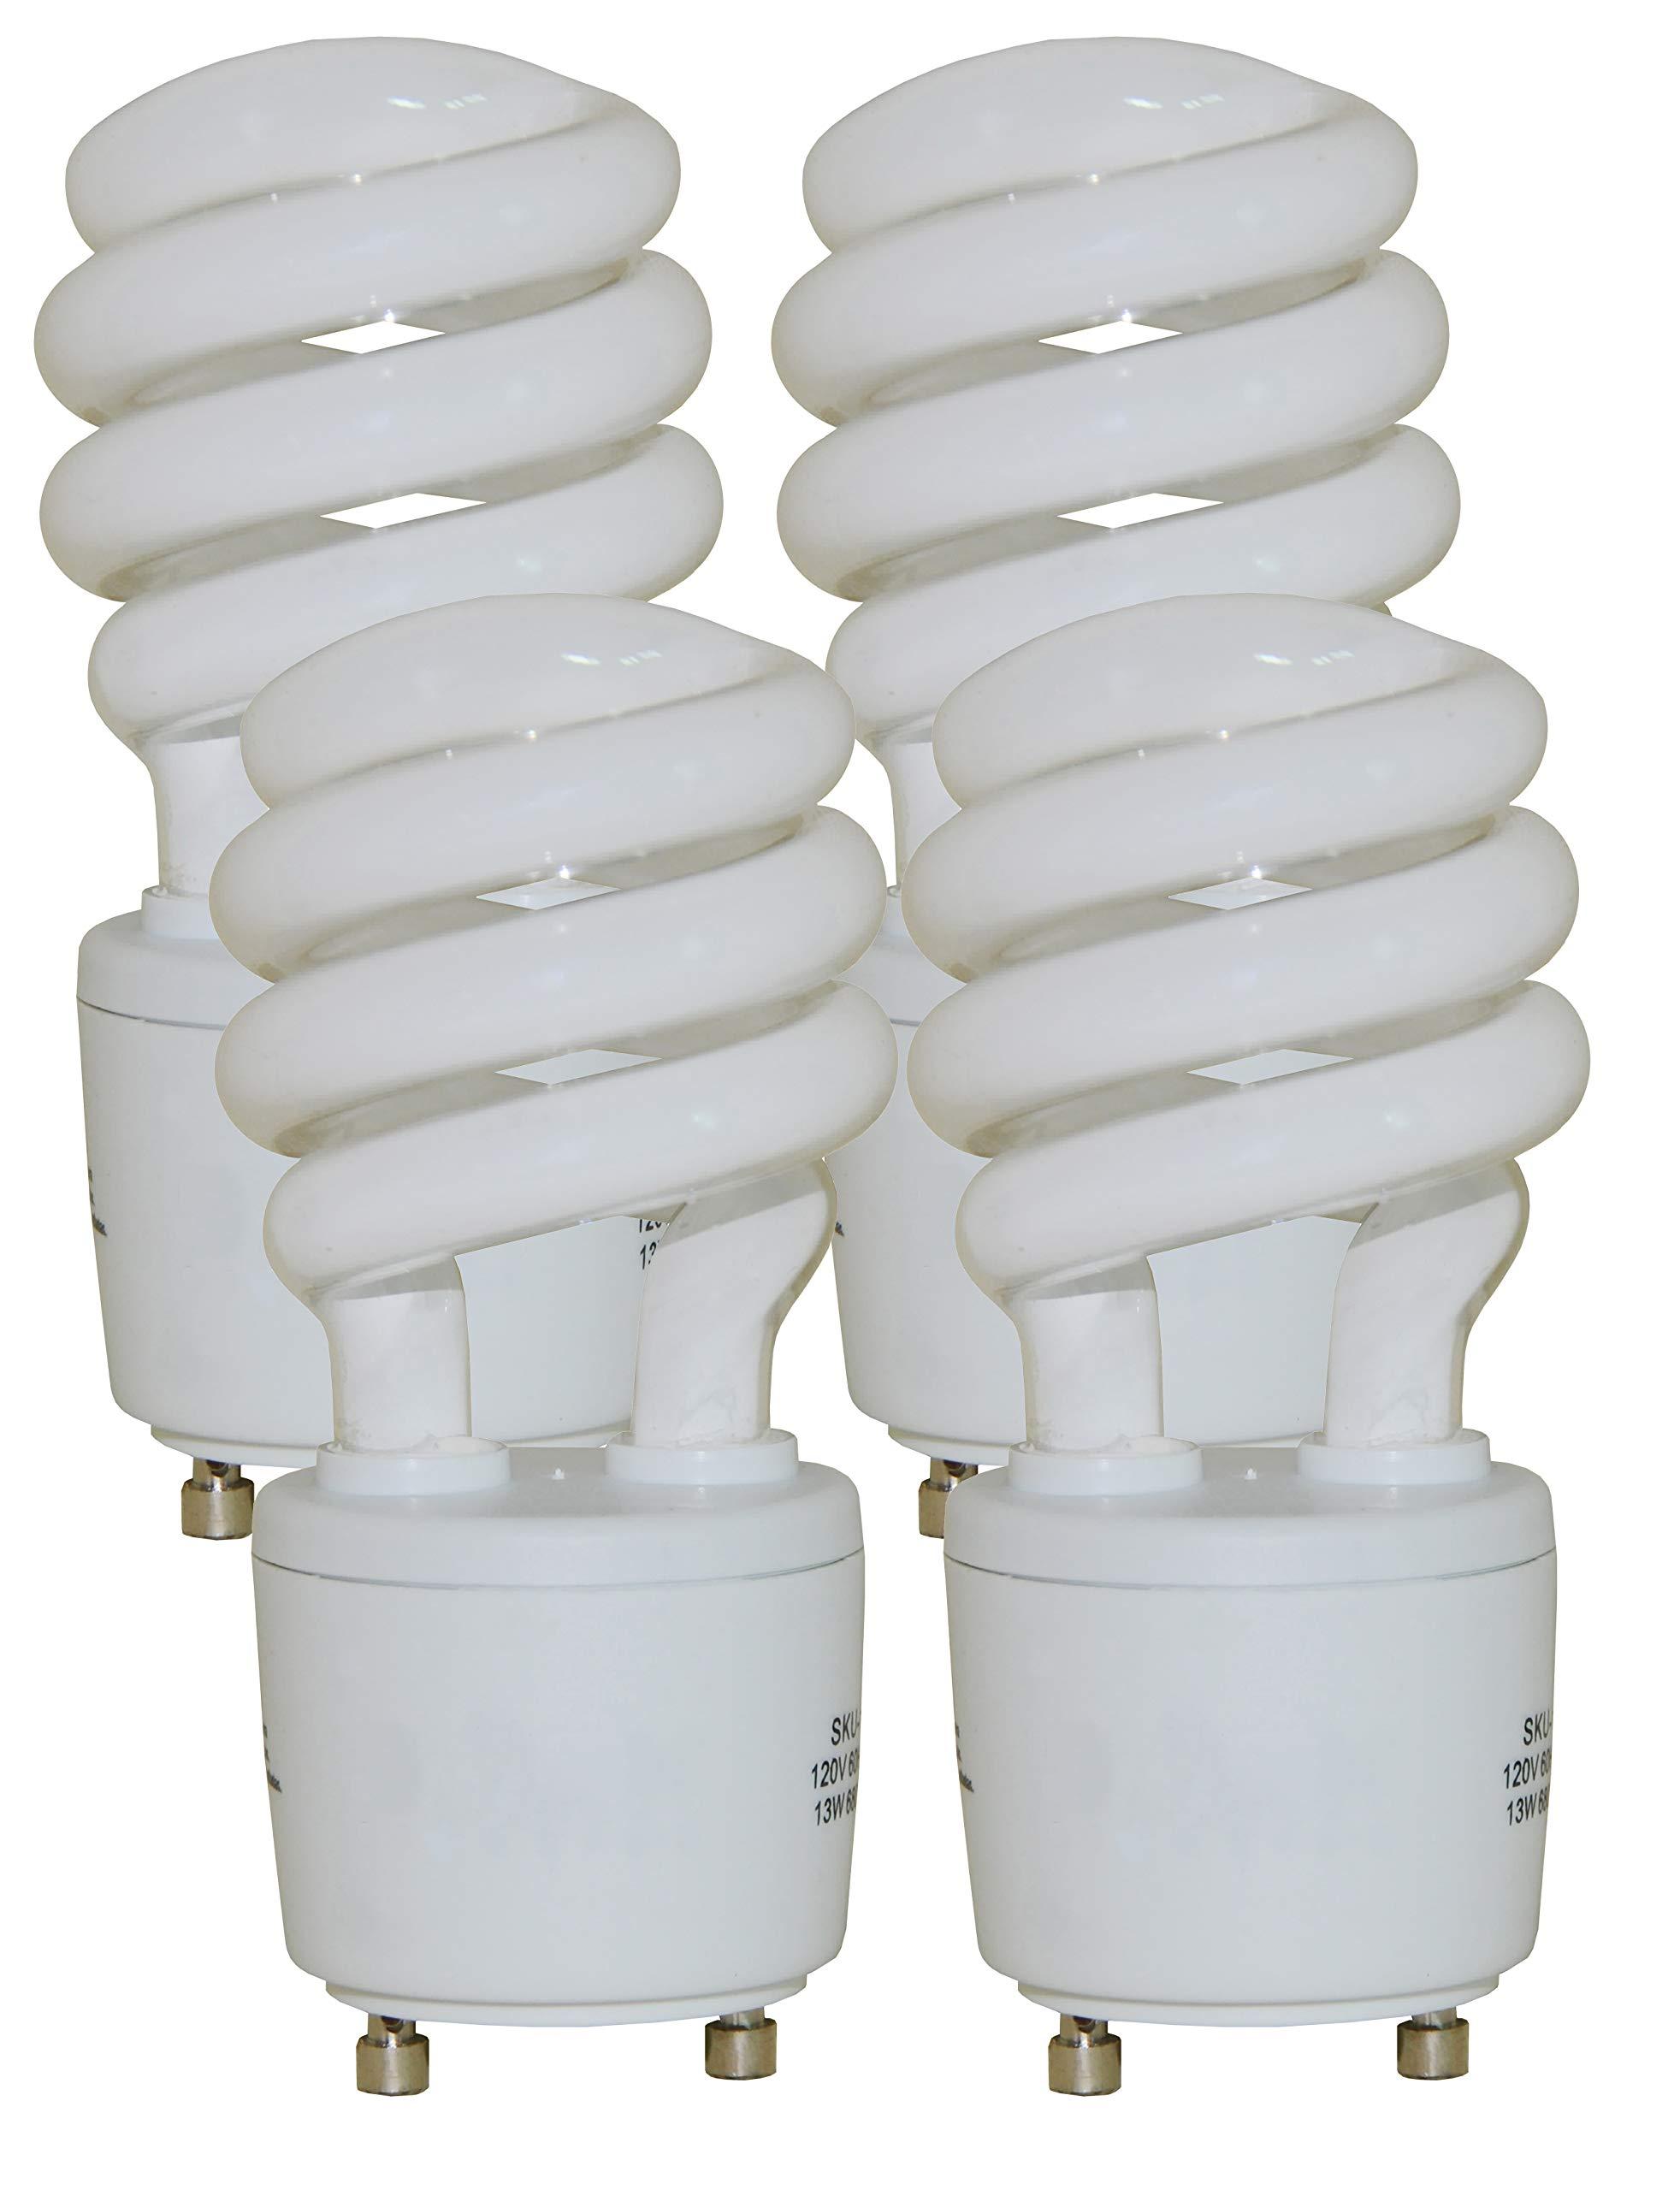 13 Watt Mini Spiral - GU24 Base - (60W Equivalent) CFL Light Bulb - 2700K Warm White - 4pack by CFL Bulb (Image #1)